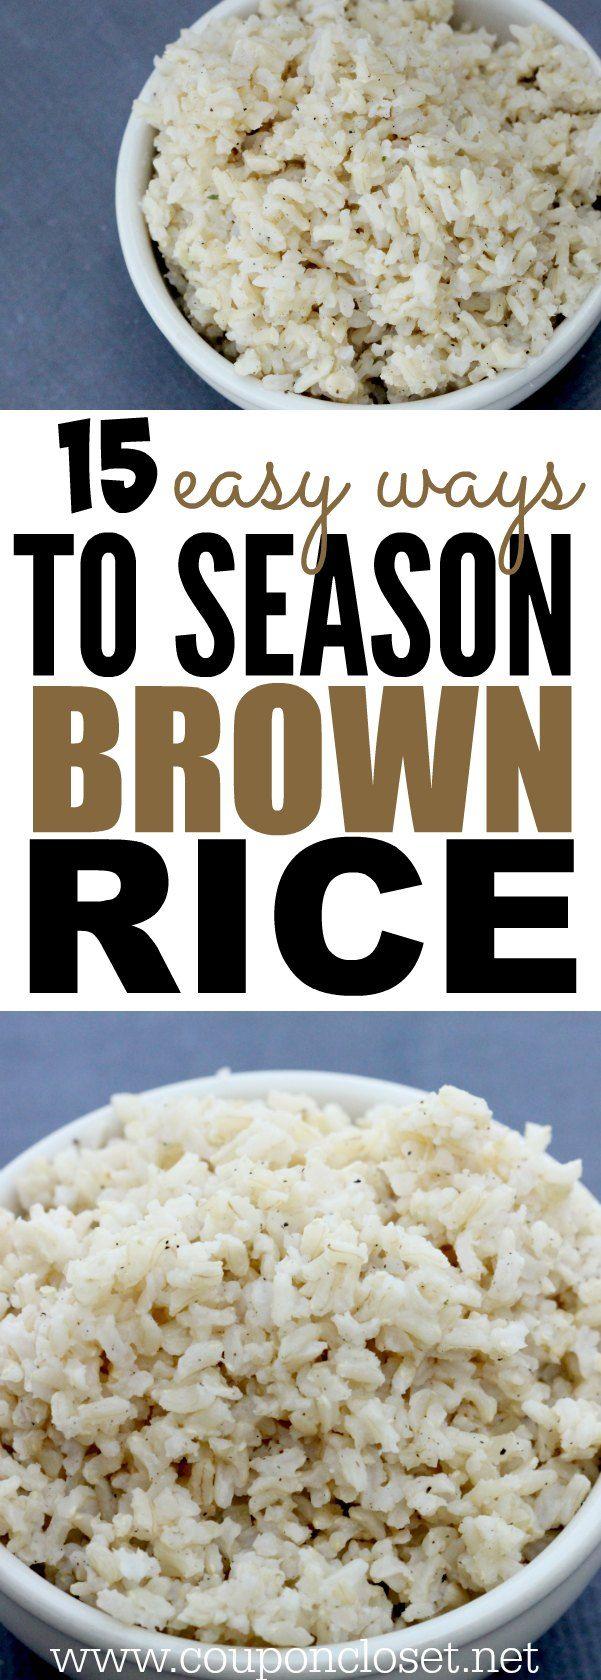 How To Season Brown Rice The Best Seasoned Brown Rice Recipes Healthy Rice Recipes Seasoned Brown Rice Recipe Food